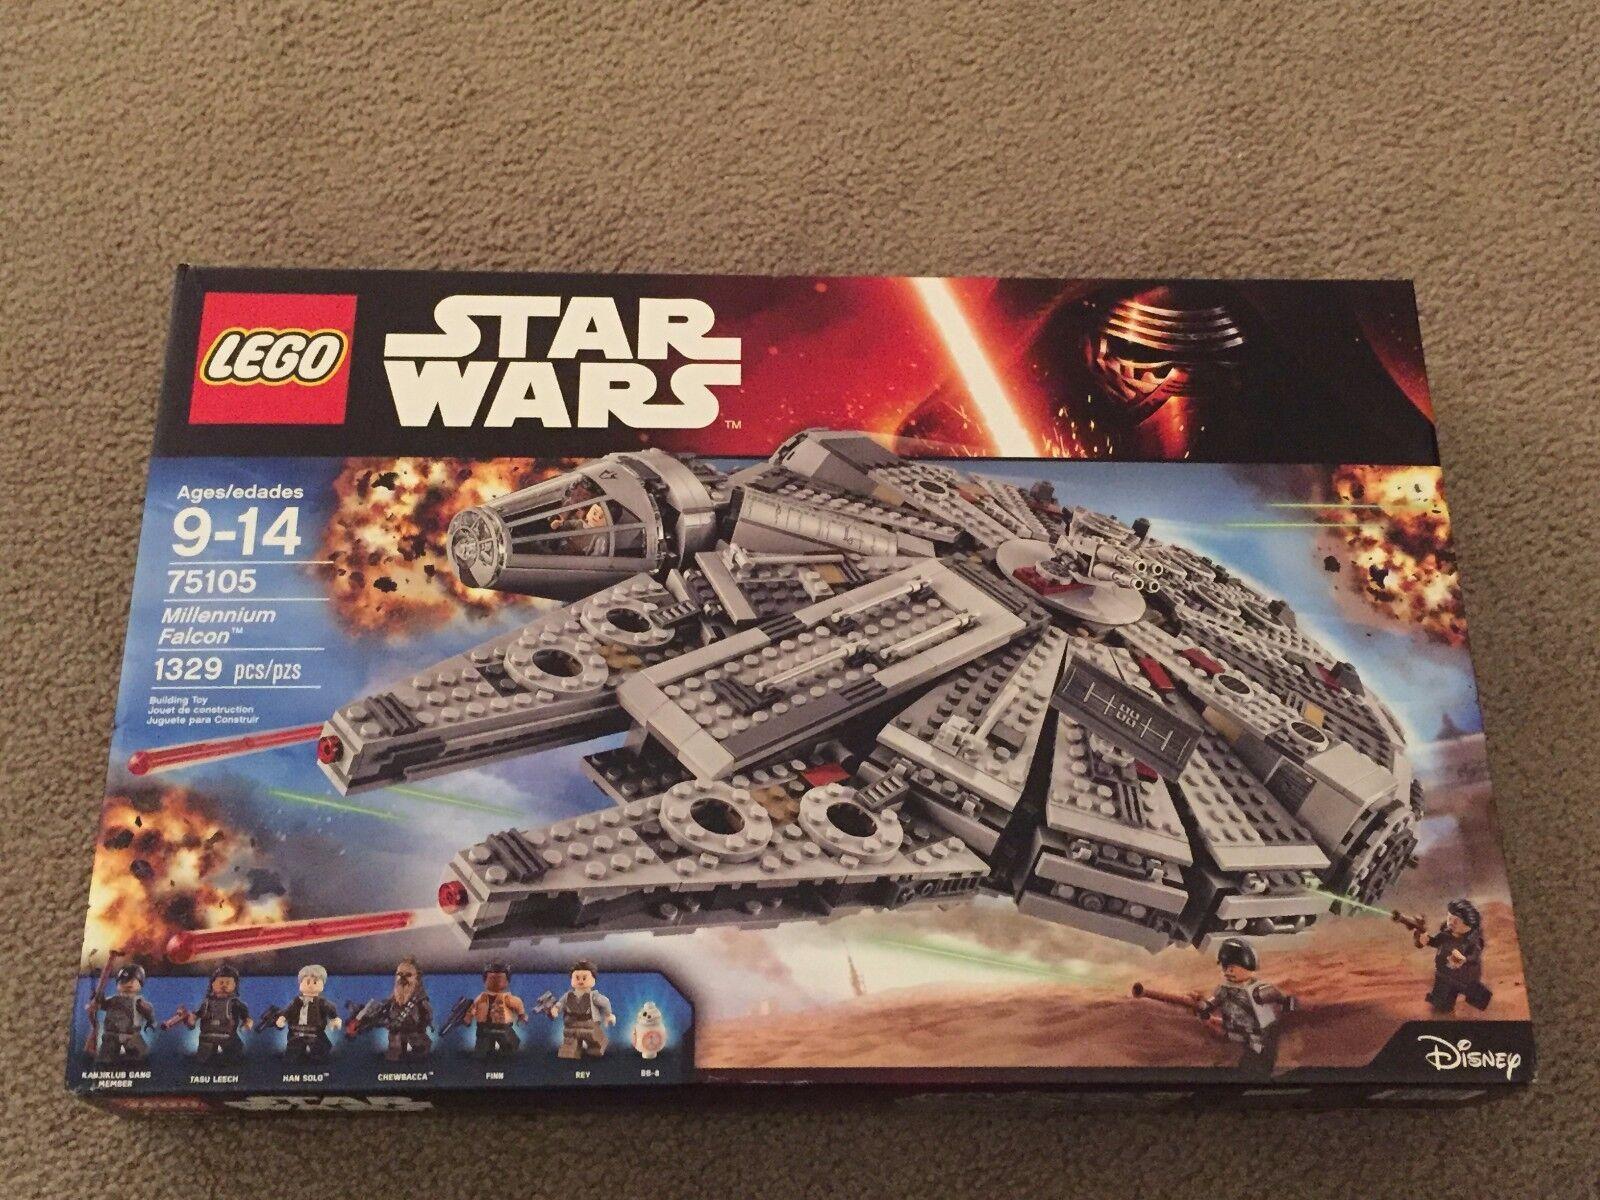 Lego Star Wars Millennium Falcon The Force Awakens 75105 Building Kit NEW